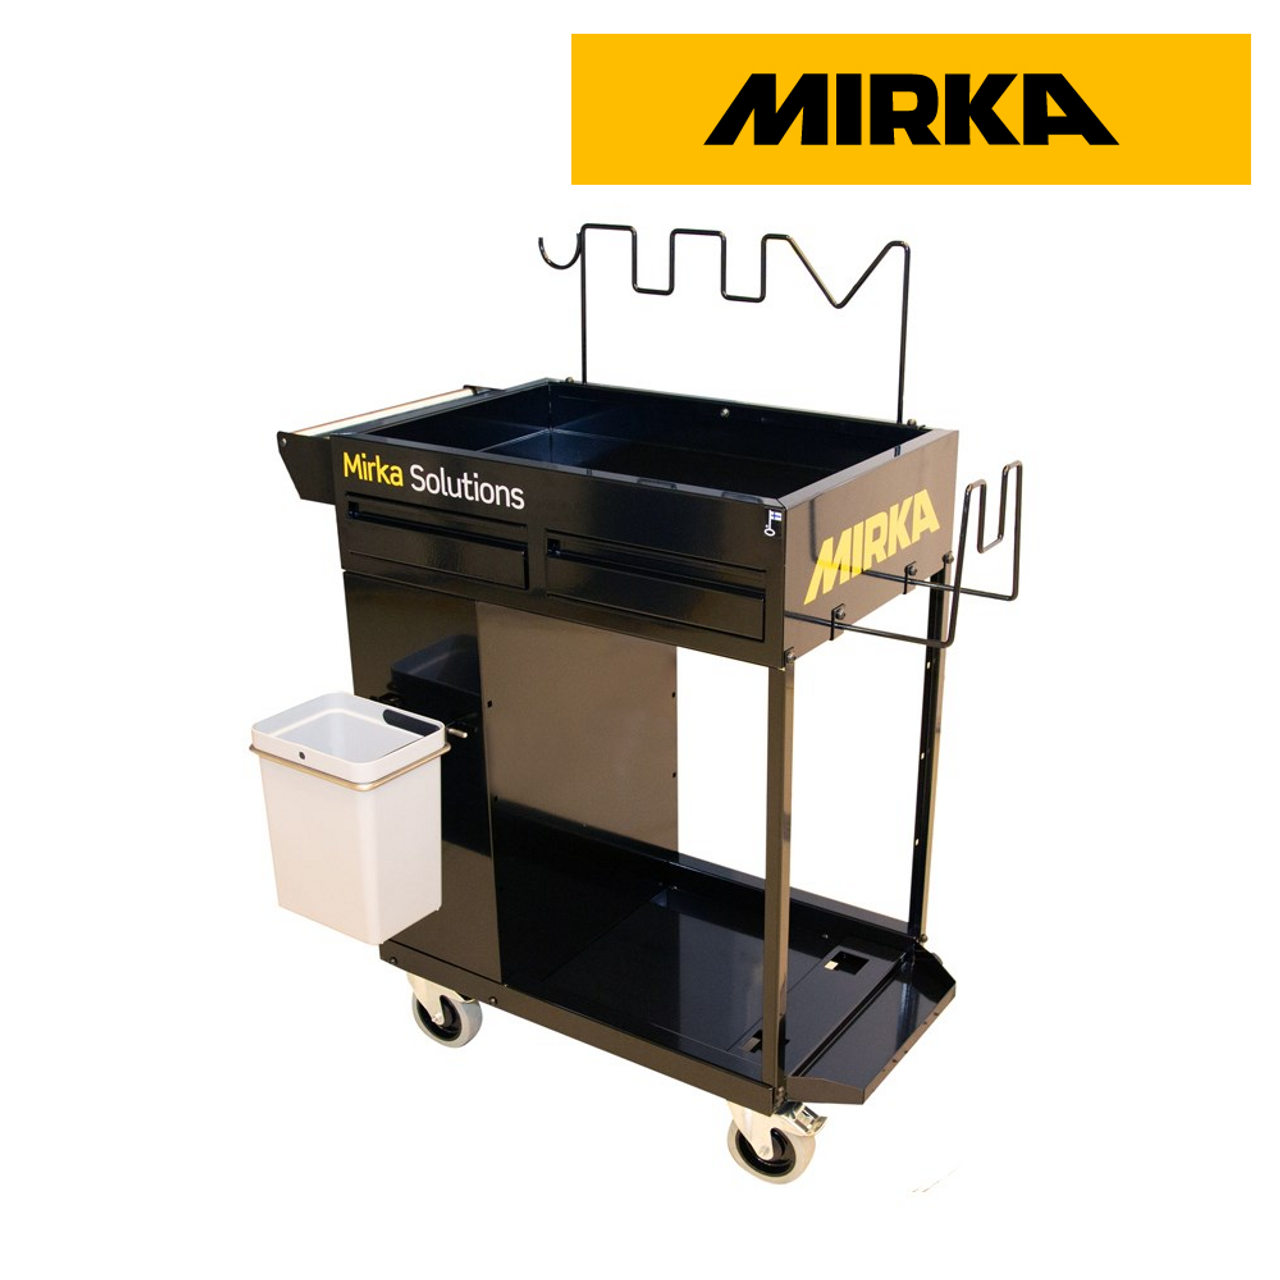 Mirka Solution Trolley